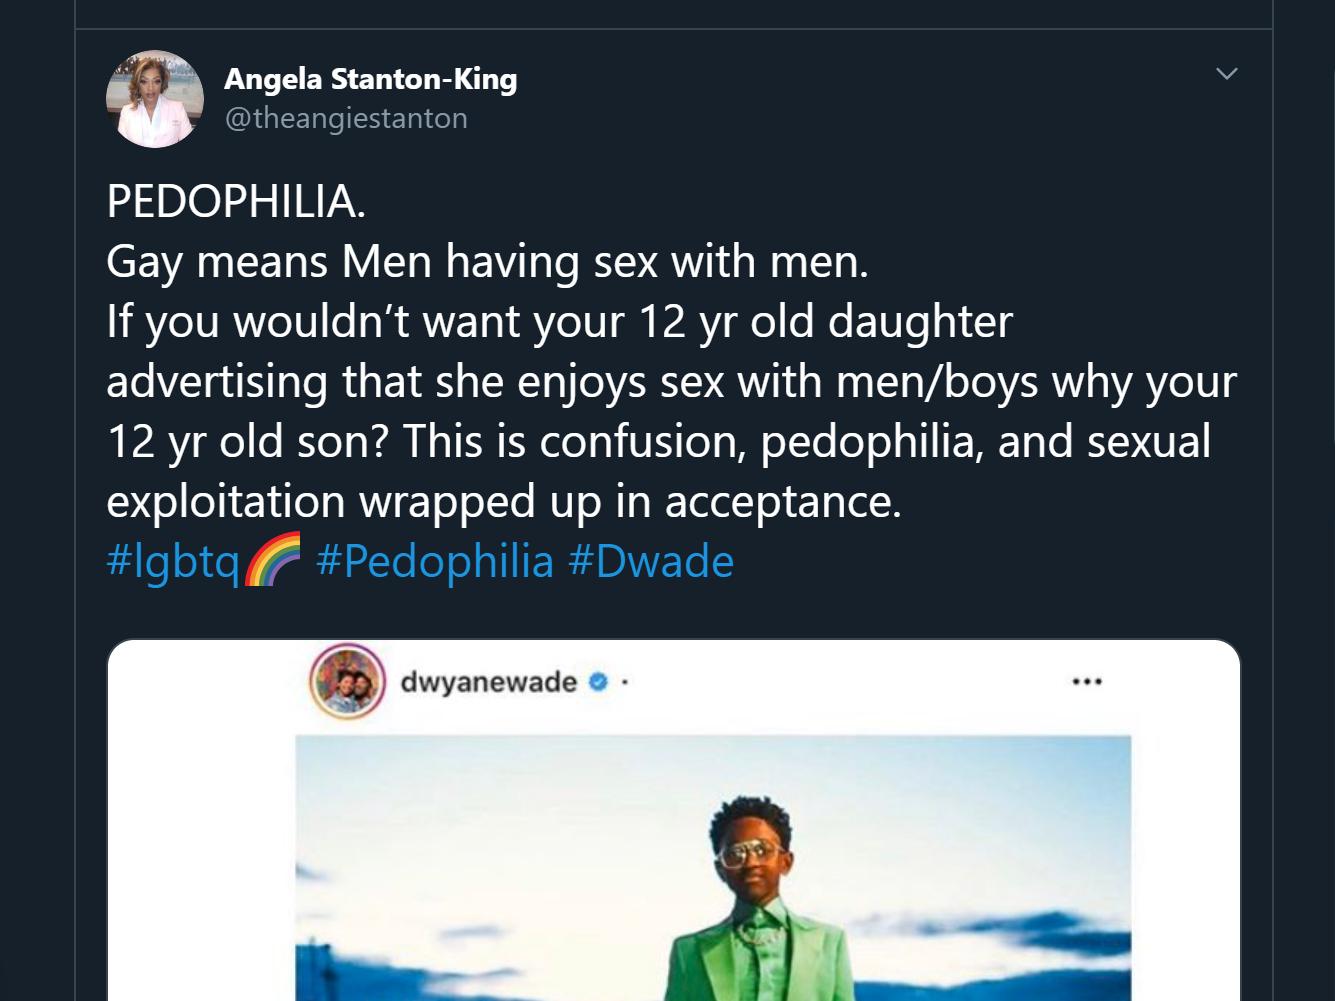 Angela Stanton-King, GOP, Republican